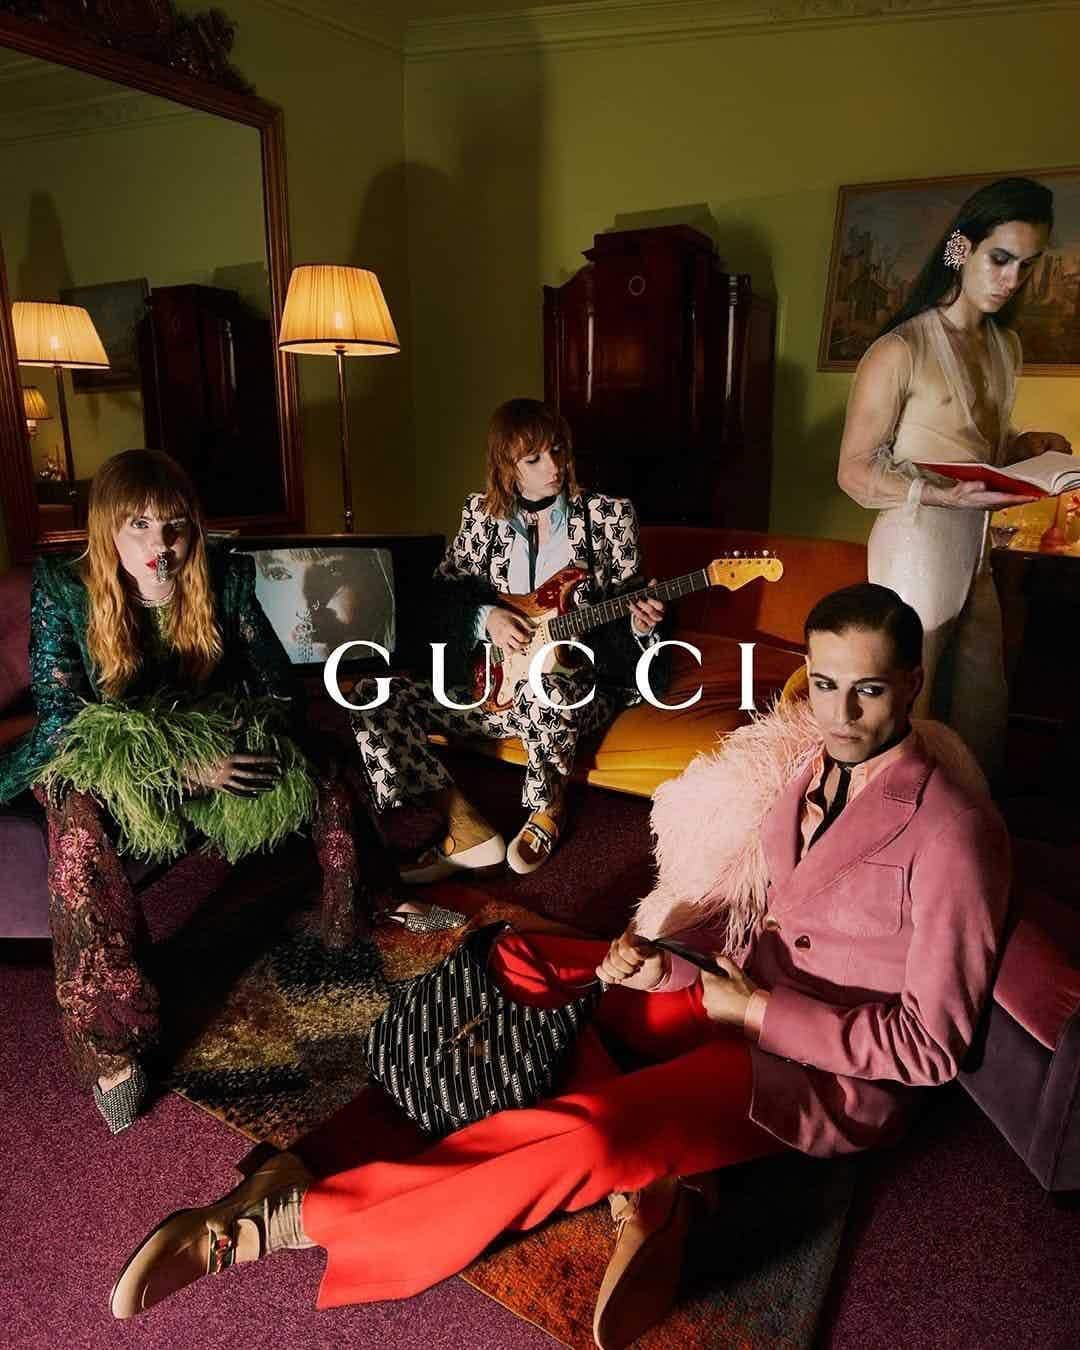 GUCCI - Aria Campaign Photographer: Mert & Marcus Model: Liam Rogers, Odinaka Ekezie, Kristen McMenamy, Maneskin Stylist: Jonathan Kaye  Location: Rome